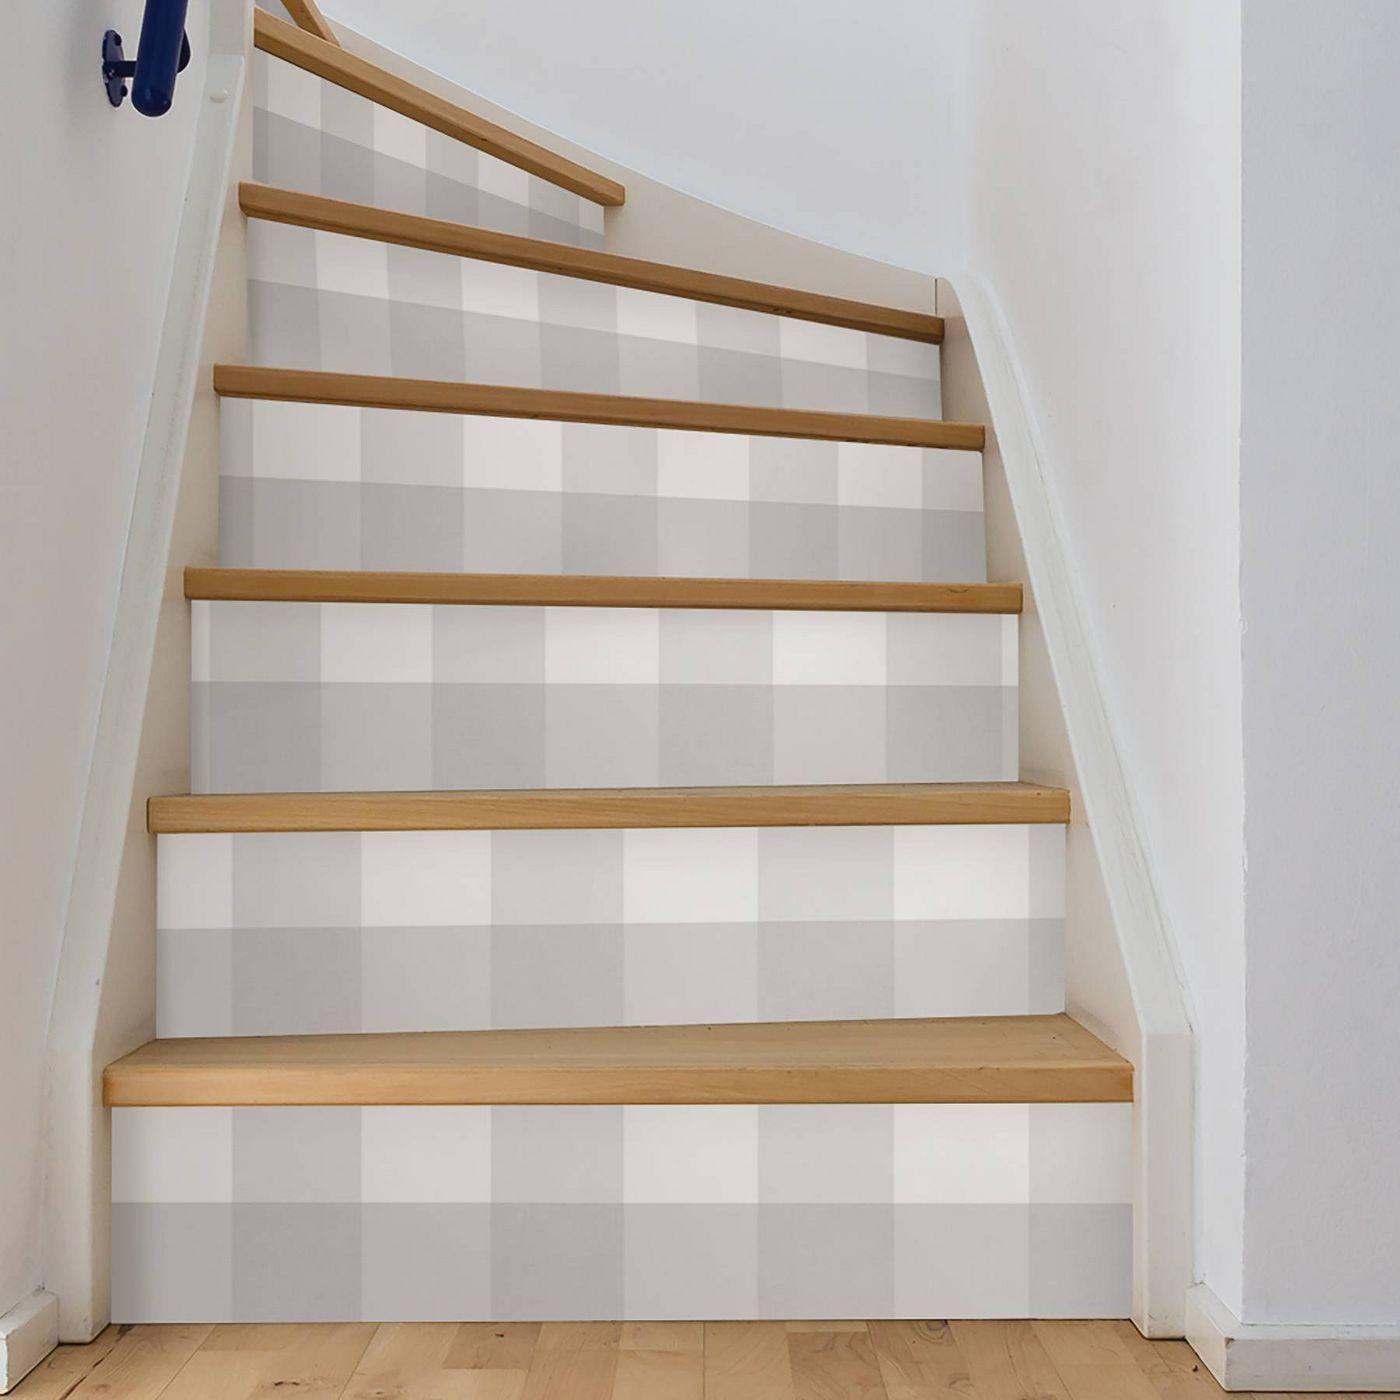 Brewster farmhouse plaid peel stick wallpaper peel and